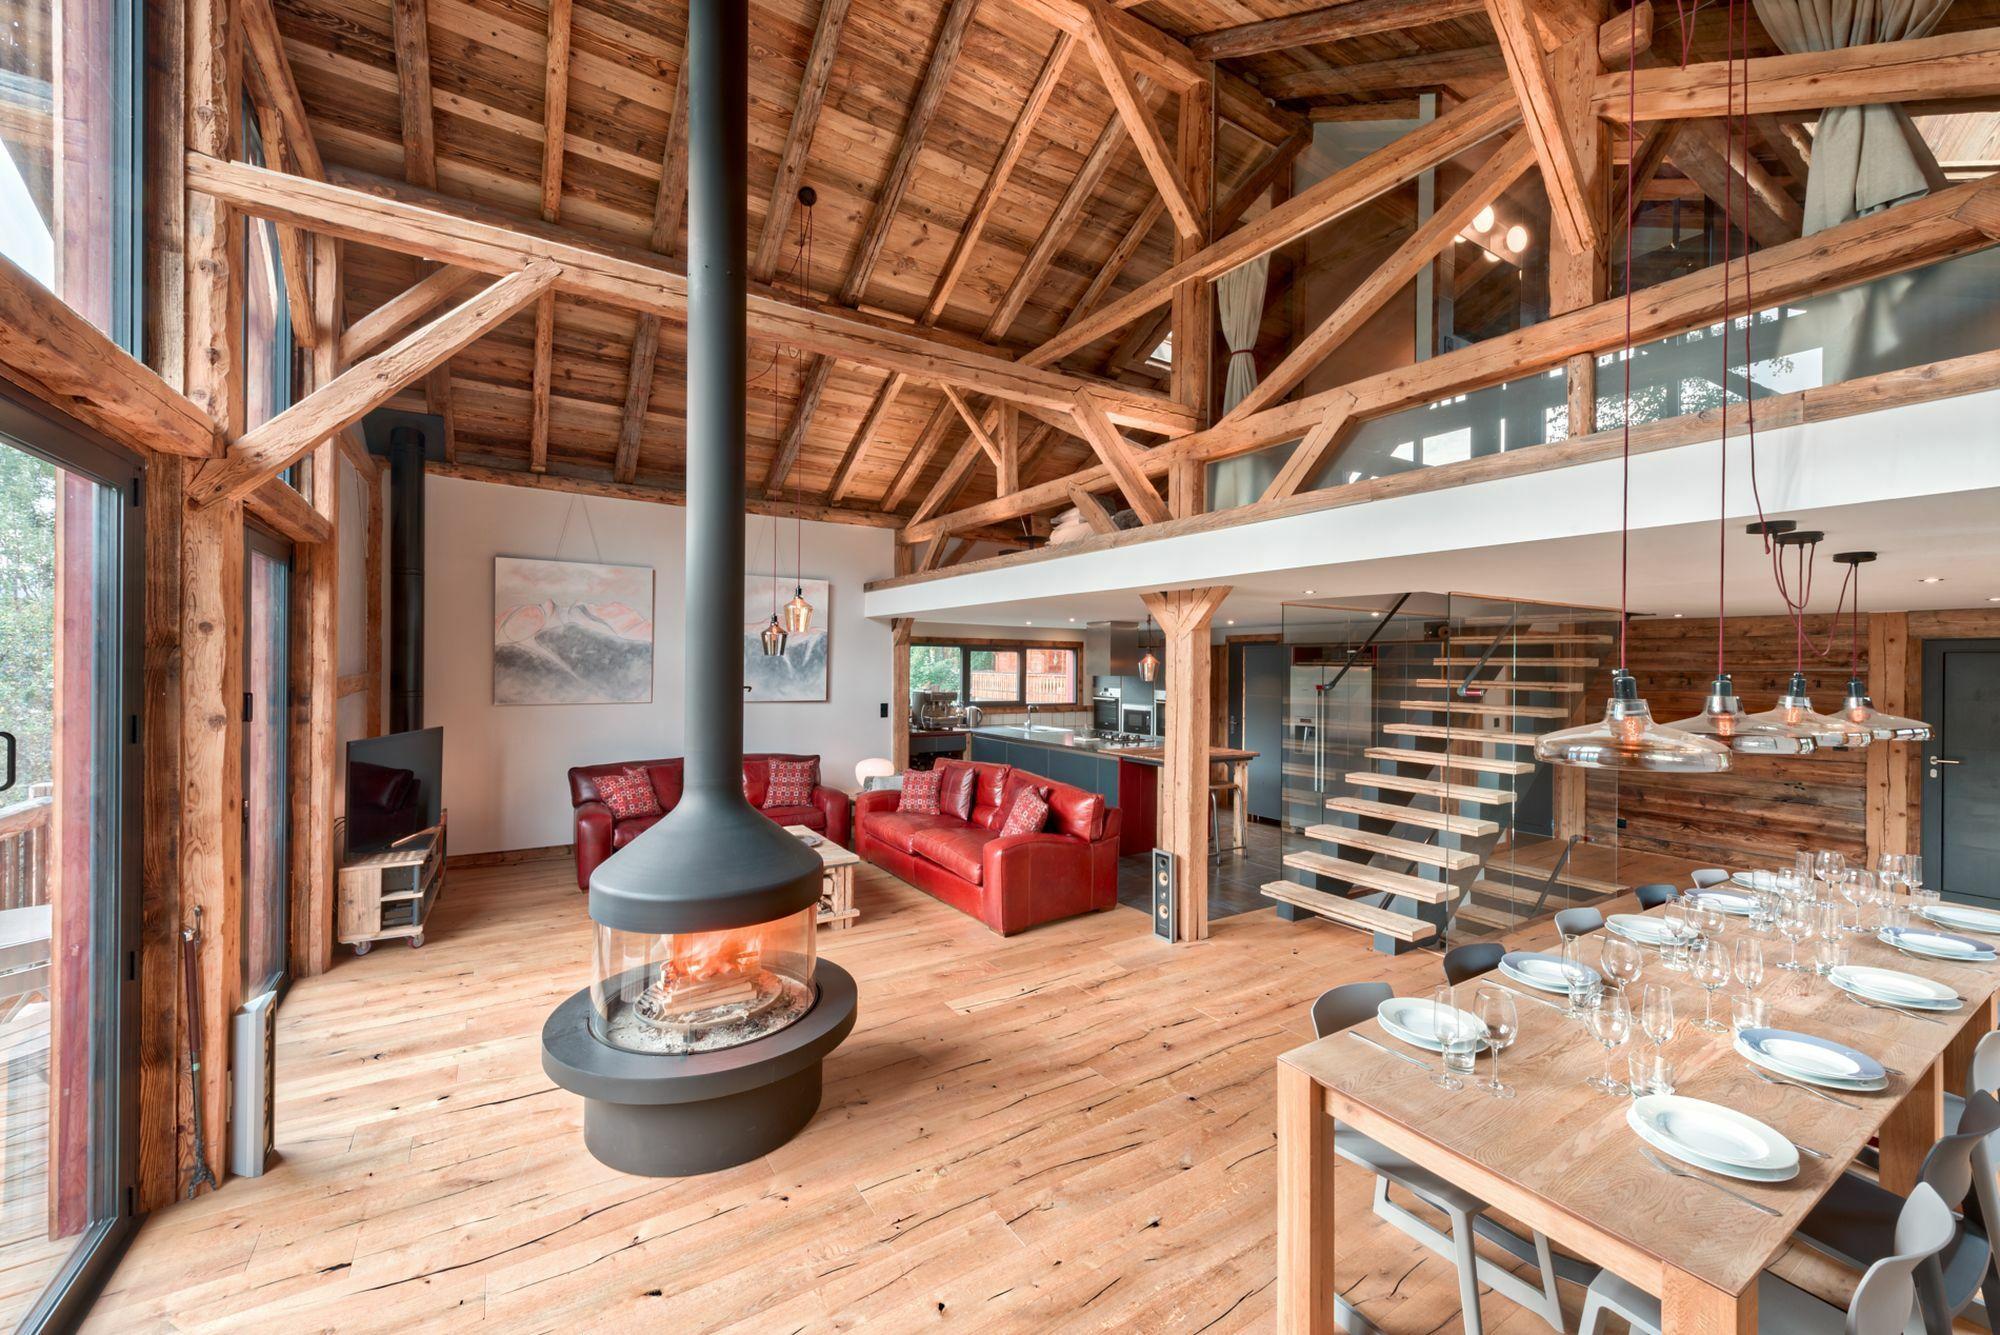 Bobb Accommodation in Morzine